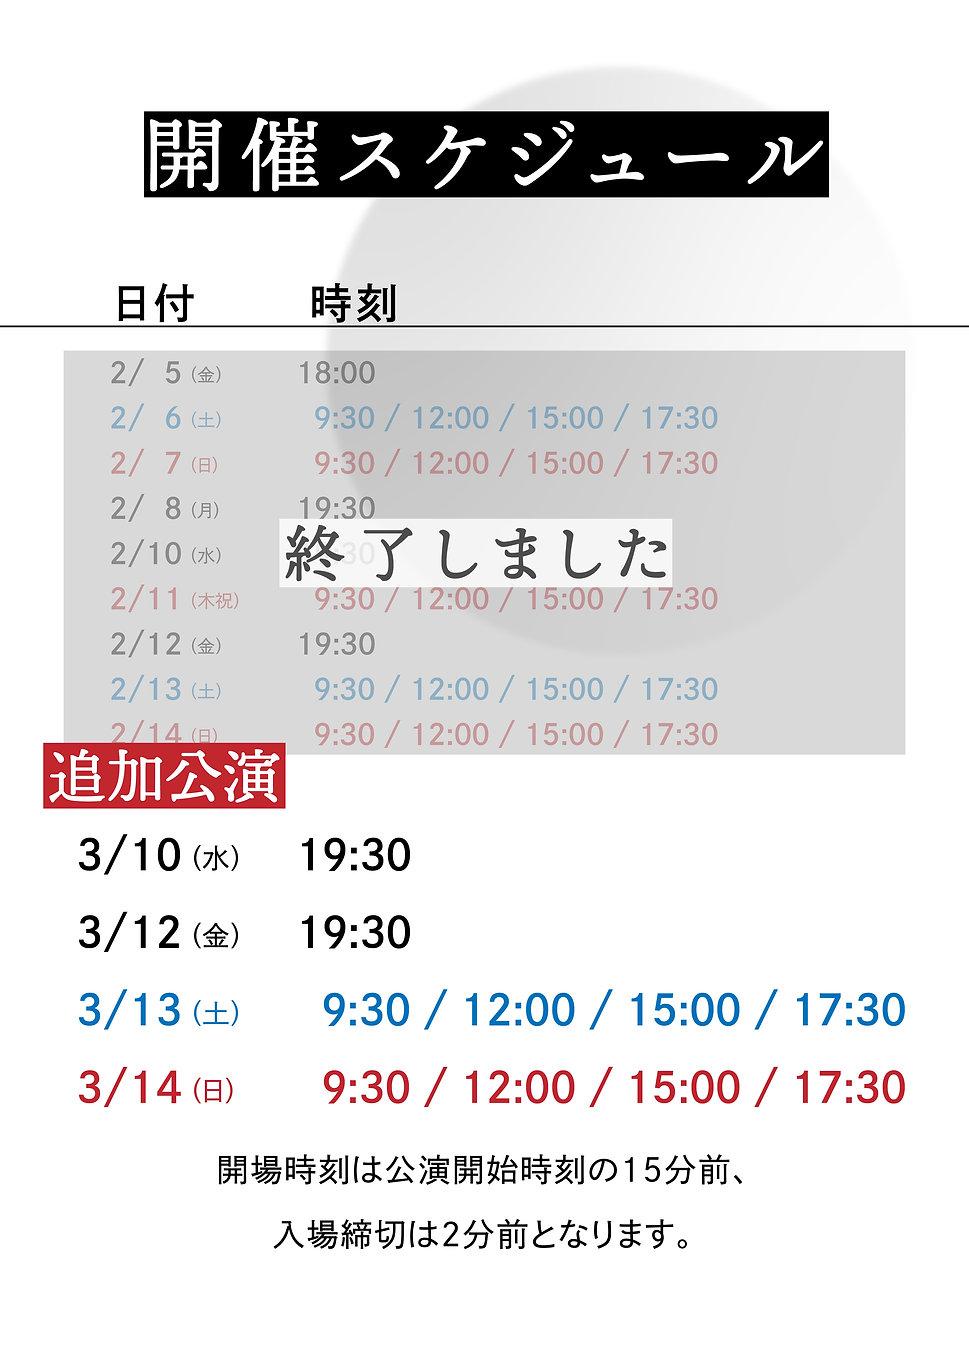 Y_schedule.jpg